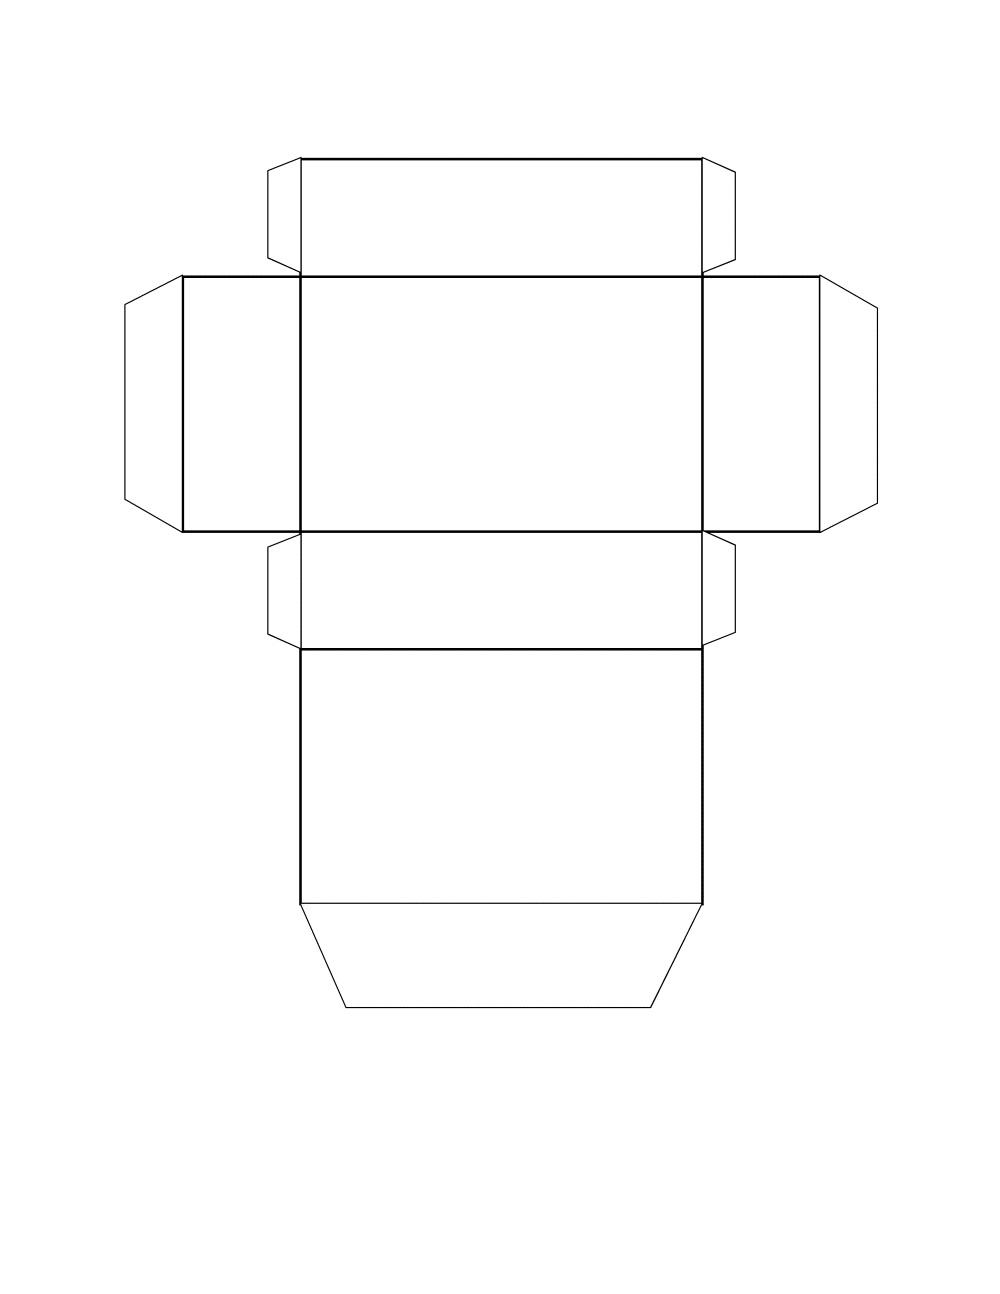 geometry nets printable 3D – Learning Printable